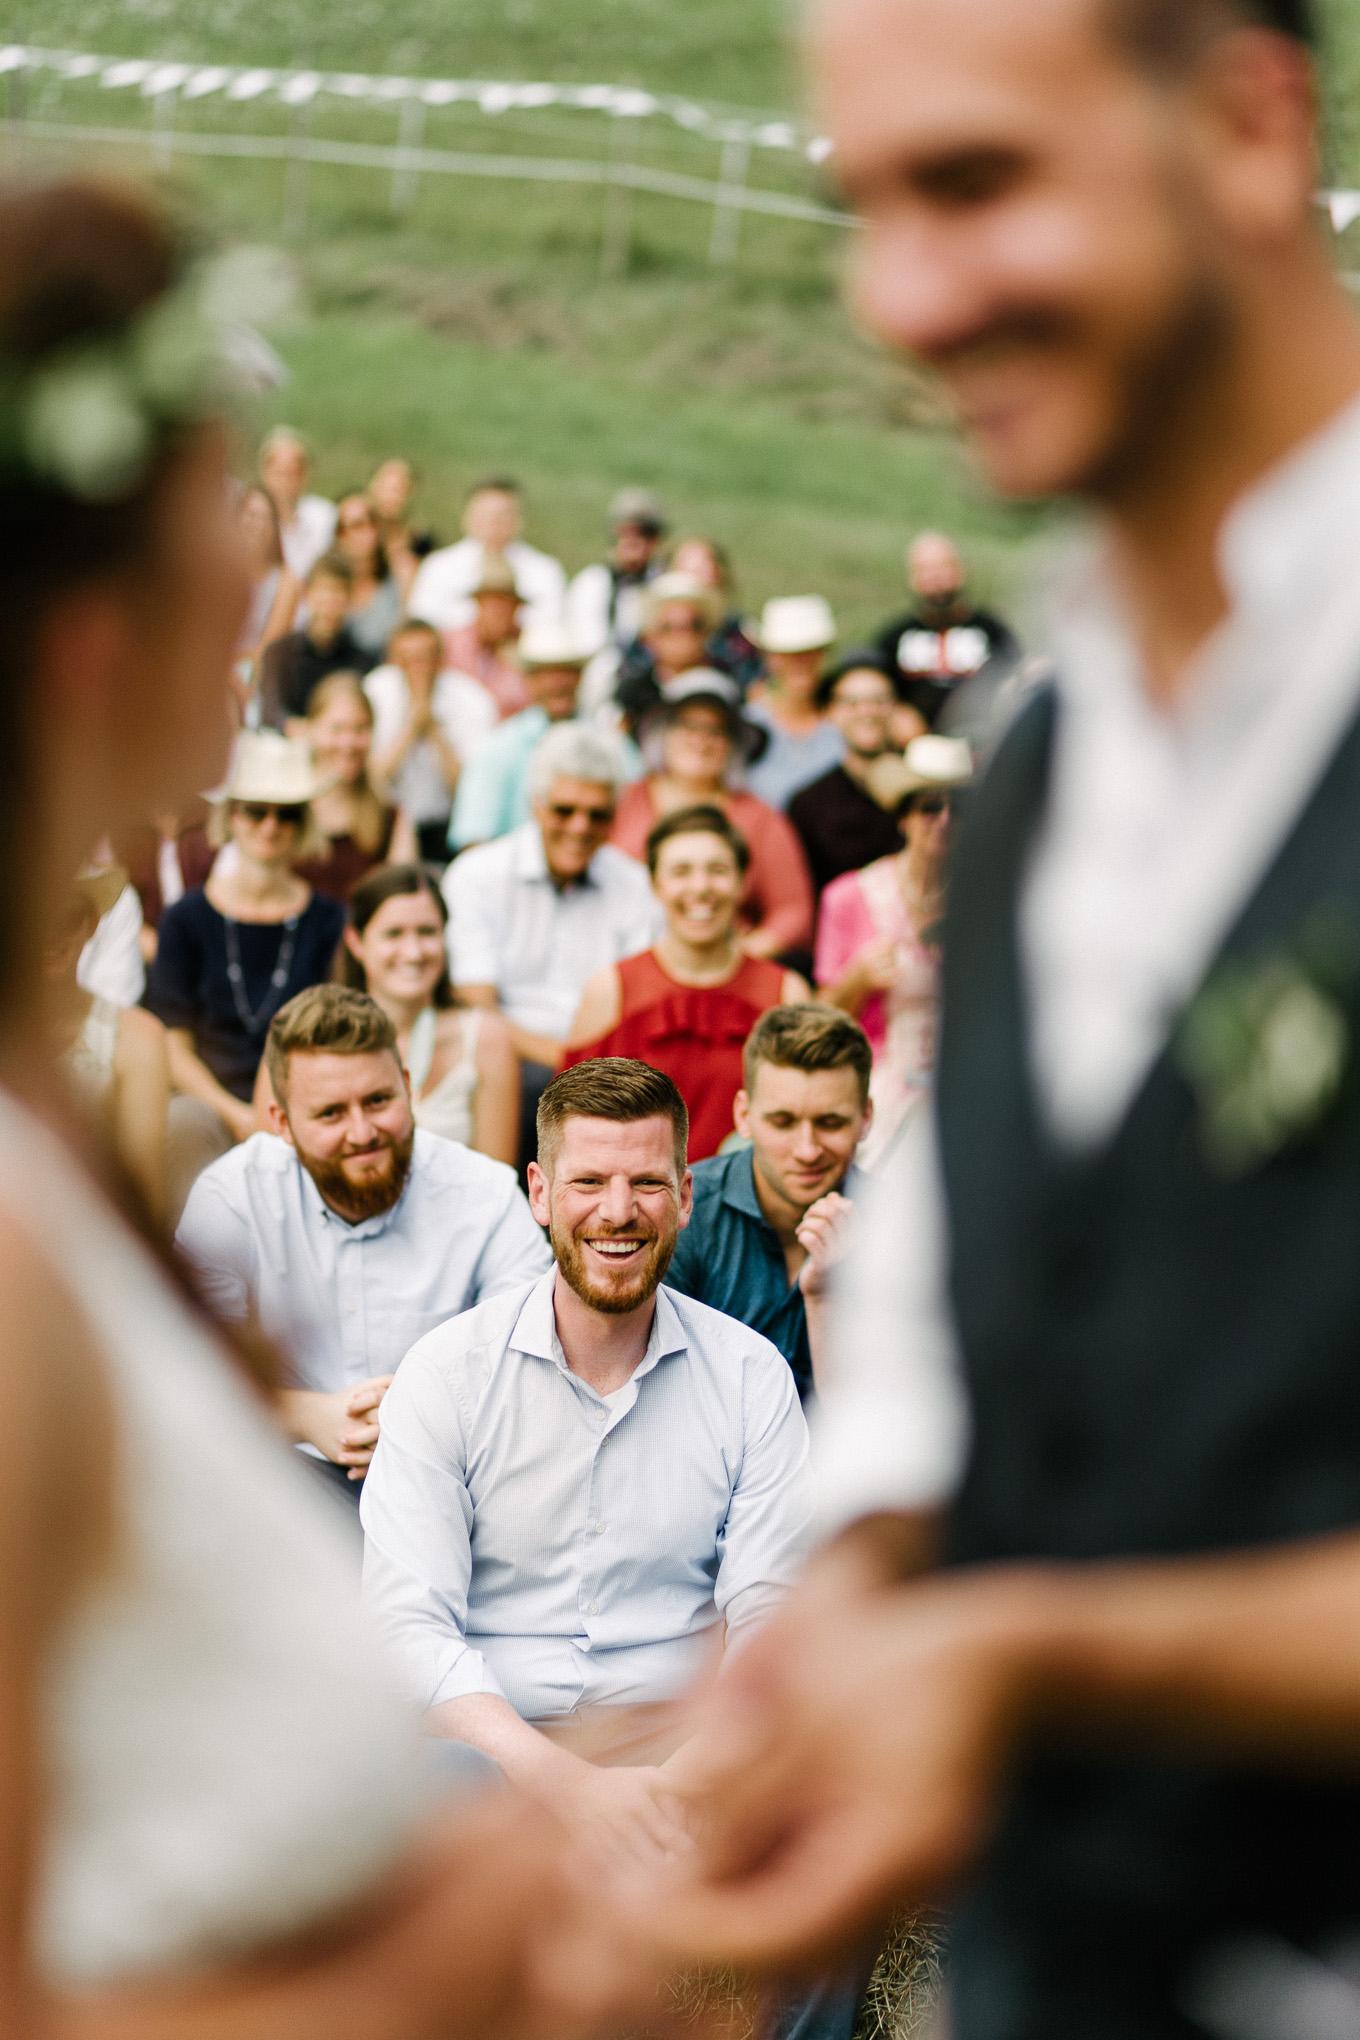 Boho-Scheune-Bauern-Hochzeit-Lörrach-Rheinfelden-Pia-Anna-Christian-Photography-NC-34.jpg